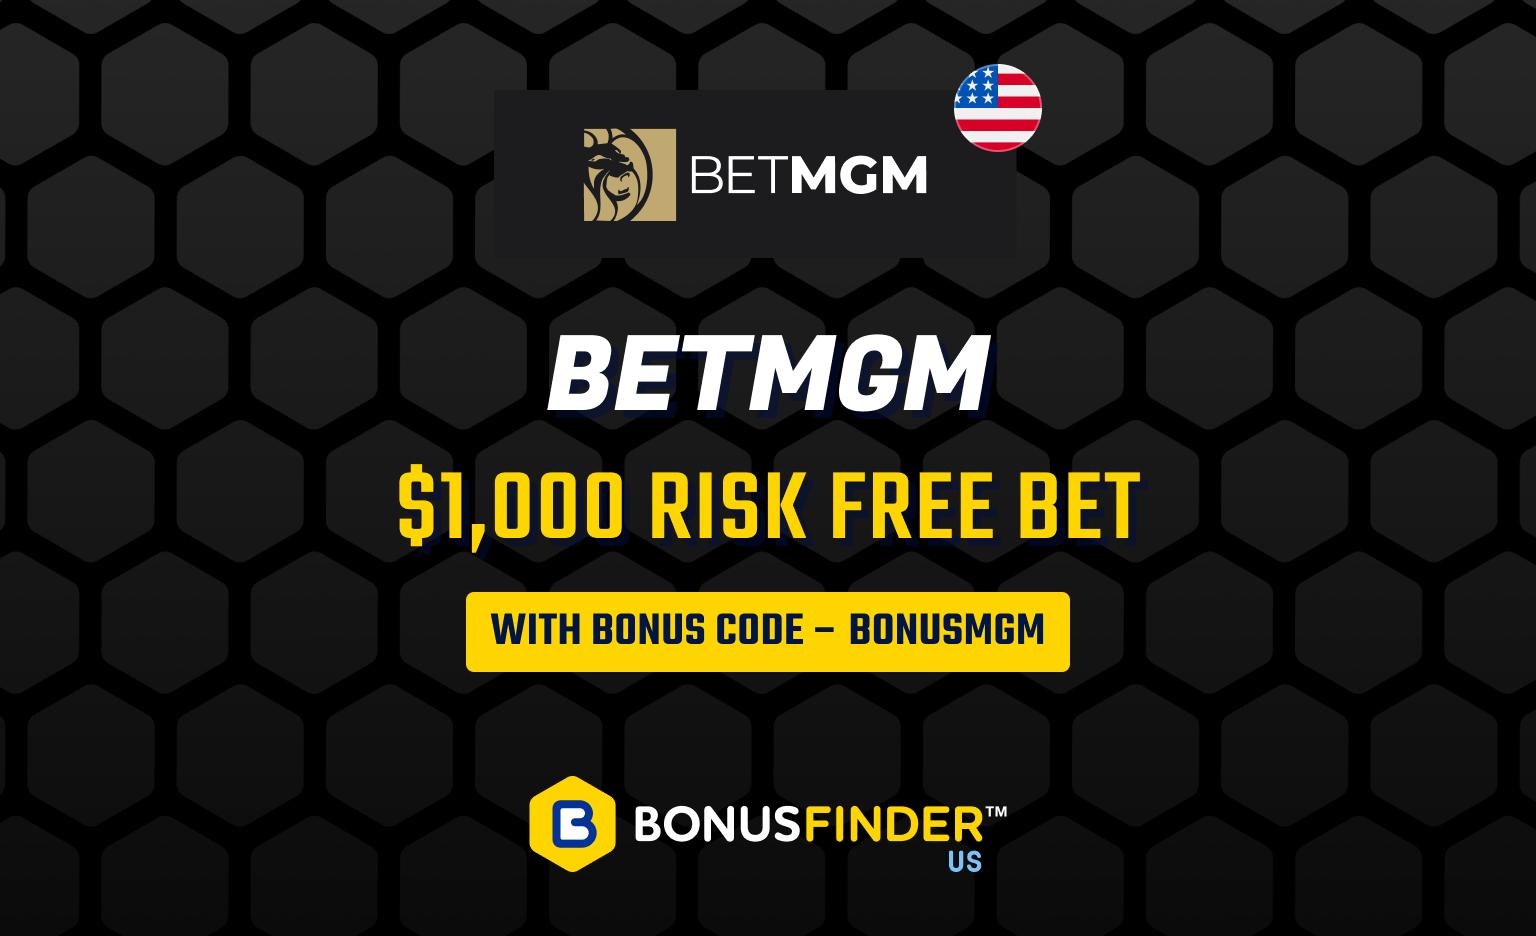 betmgm sportsbook bonus